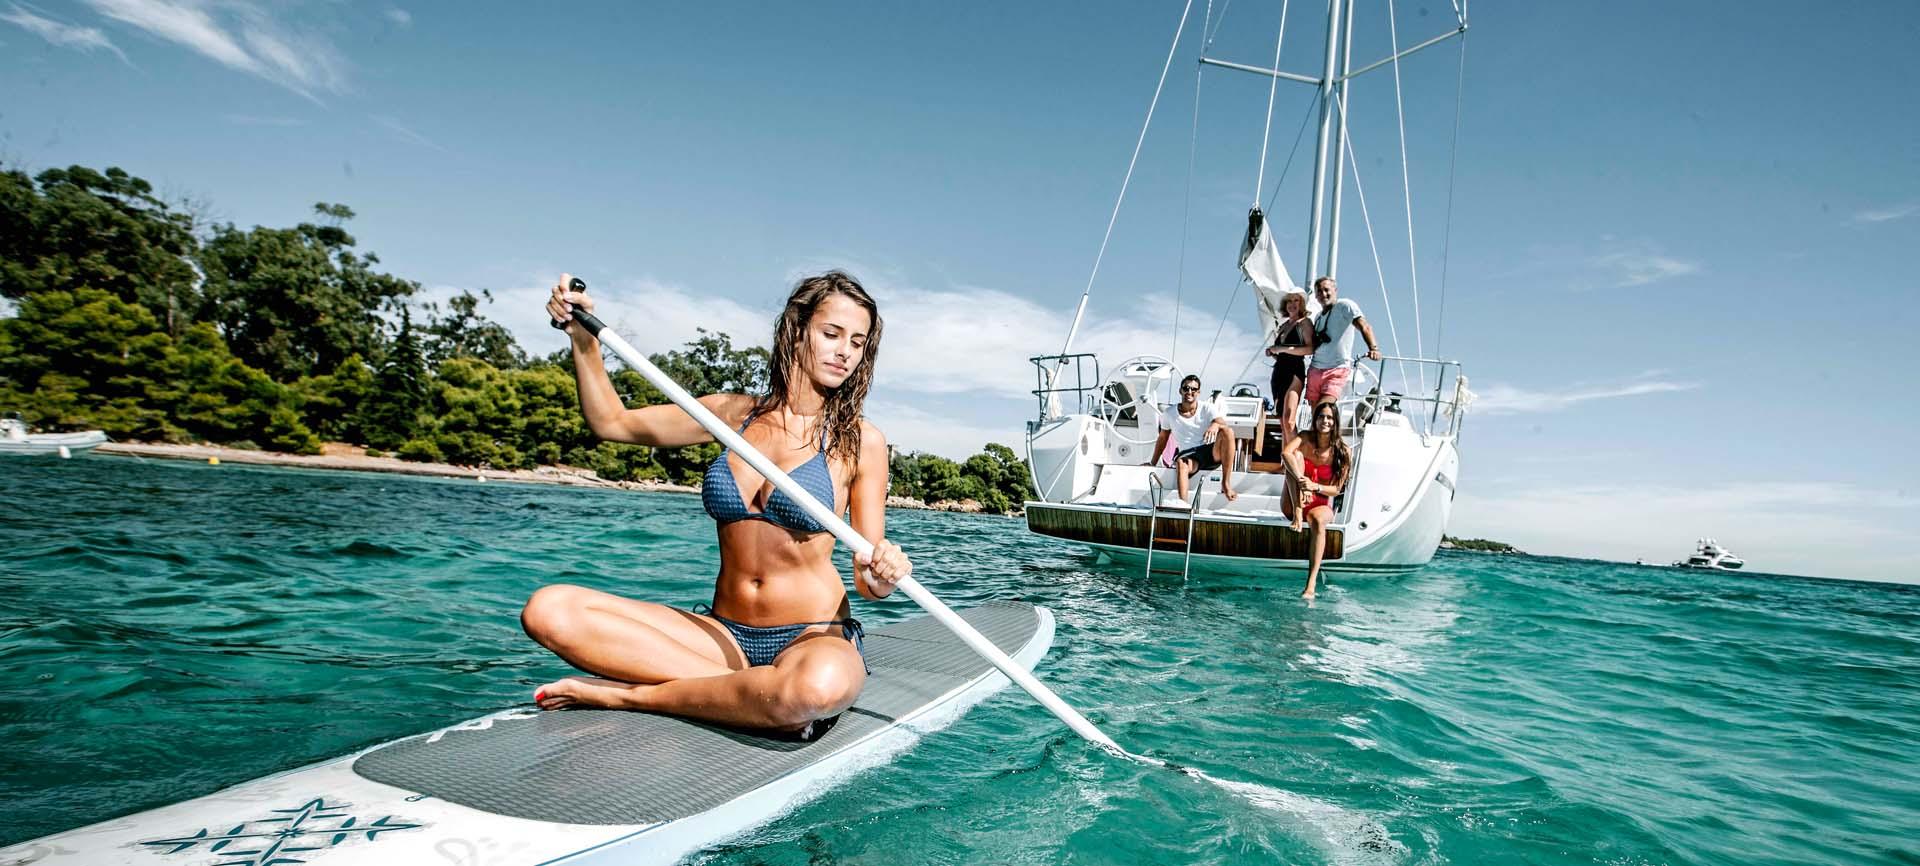 sailingyachts07